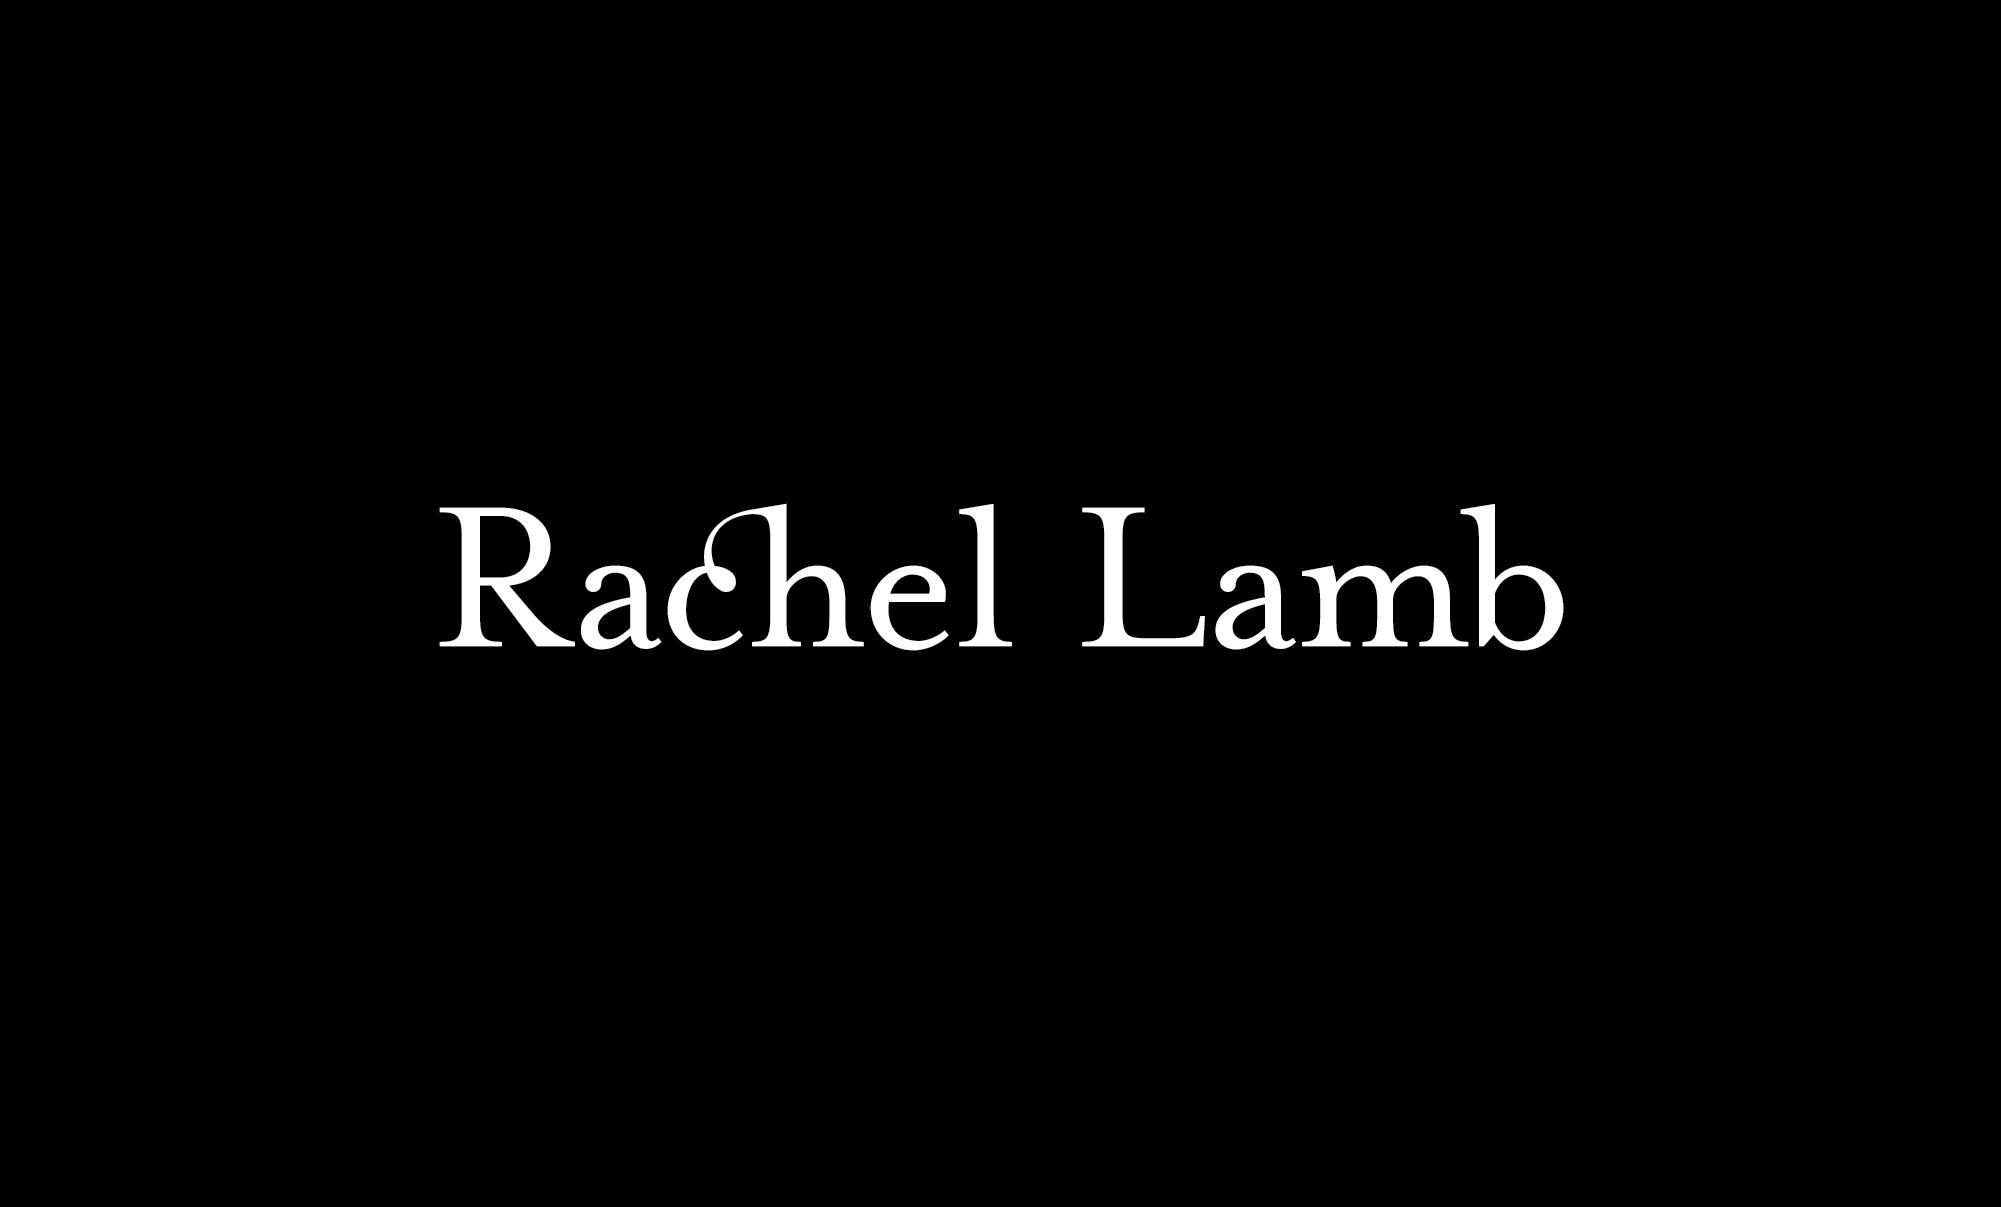 Rachel Lamb